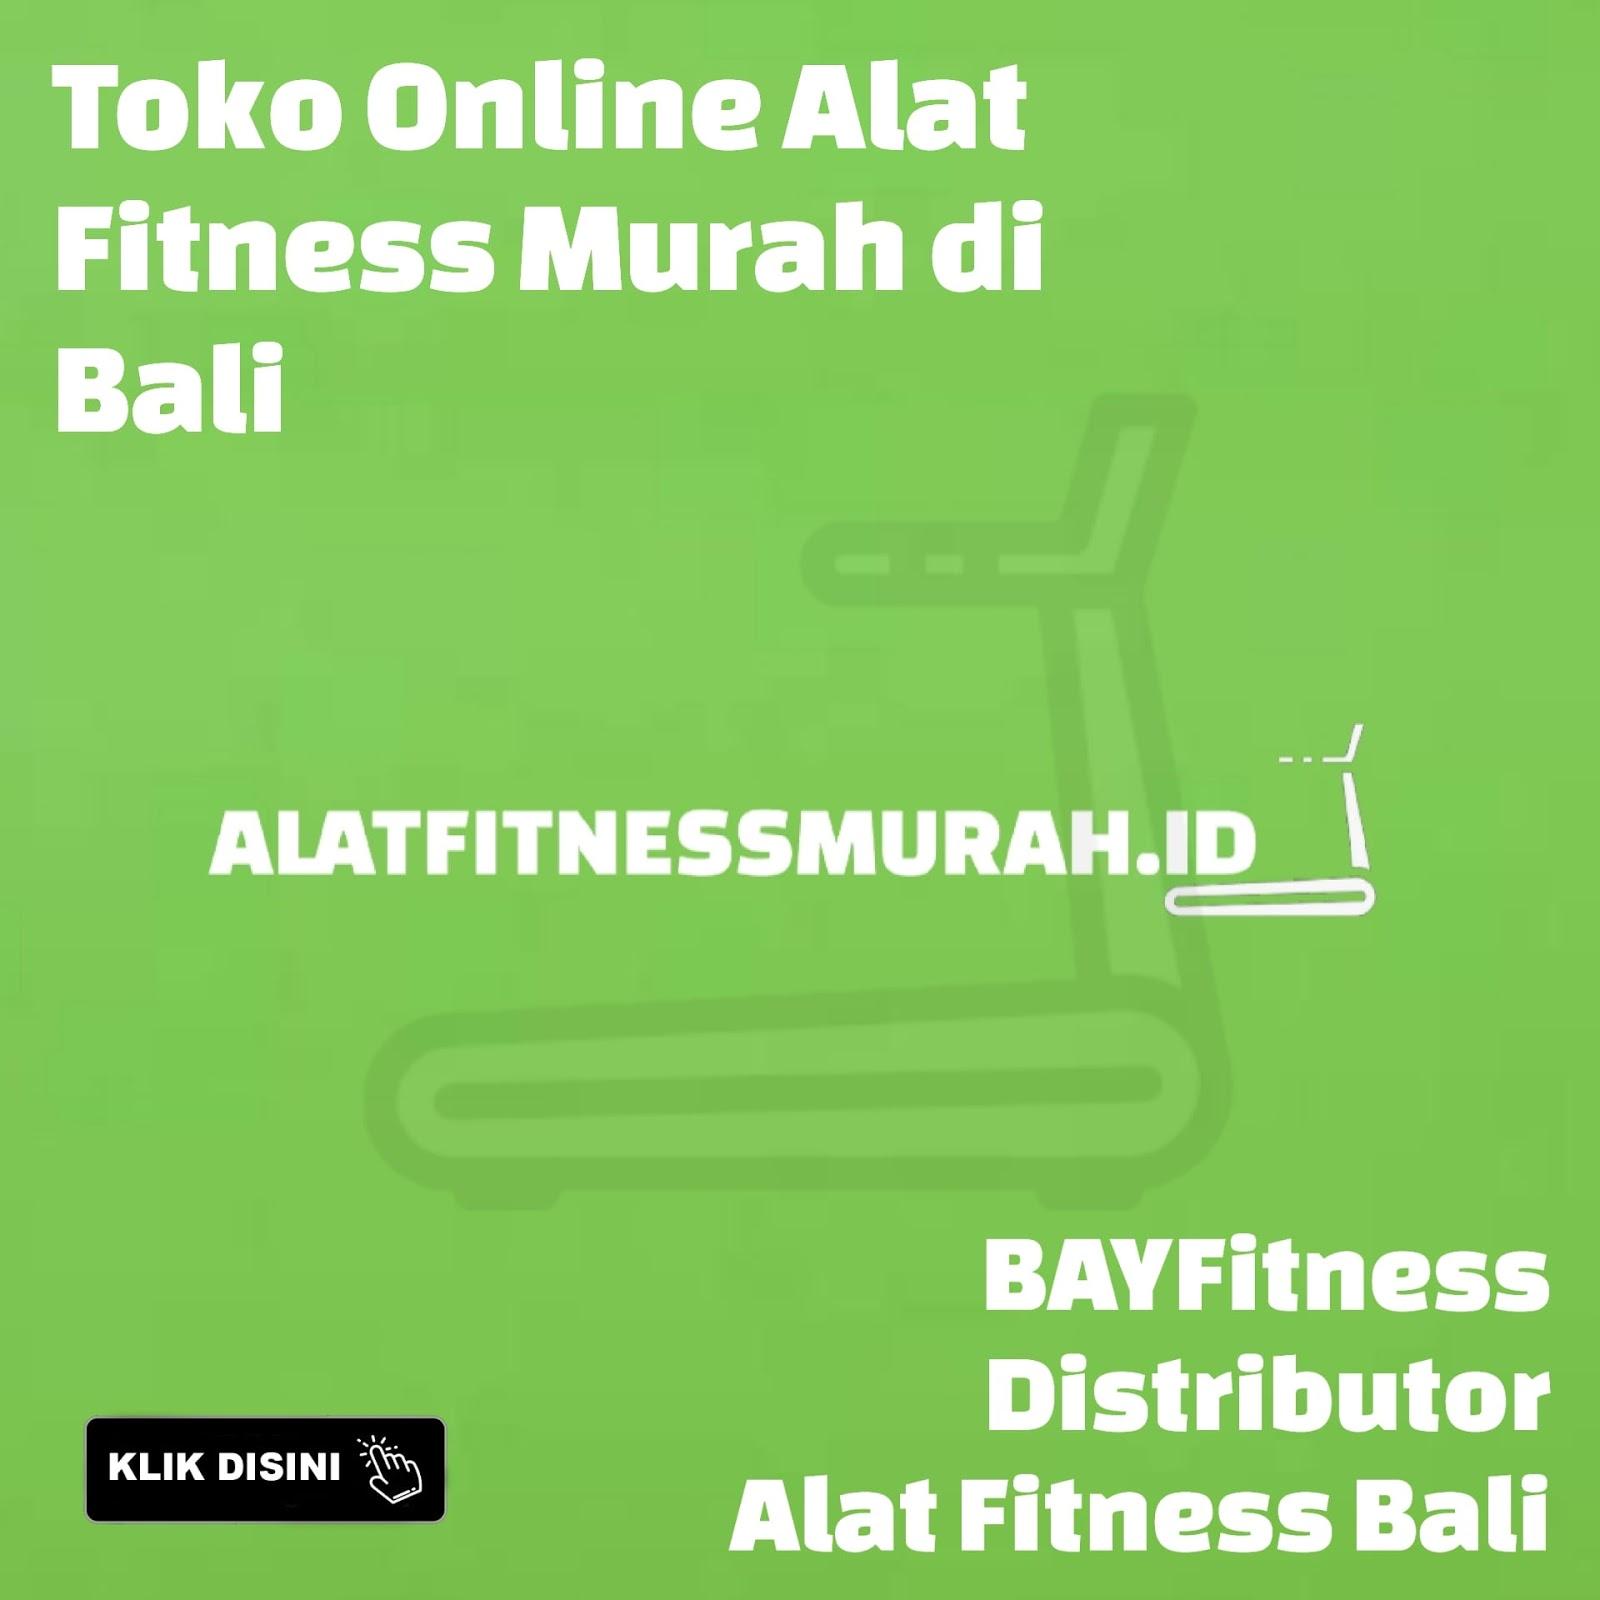 Alat Fitness Bali